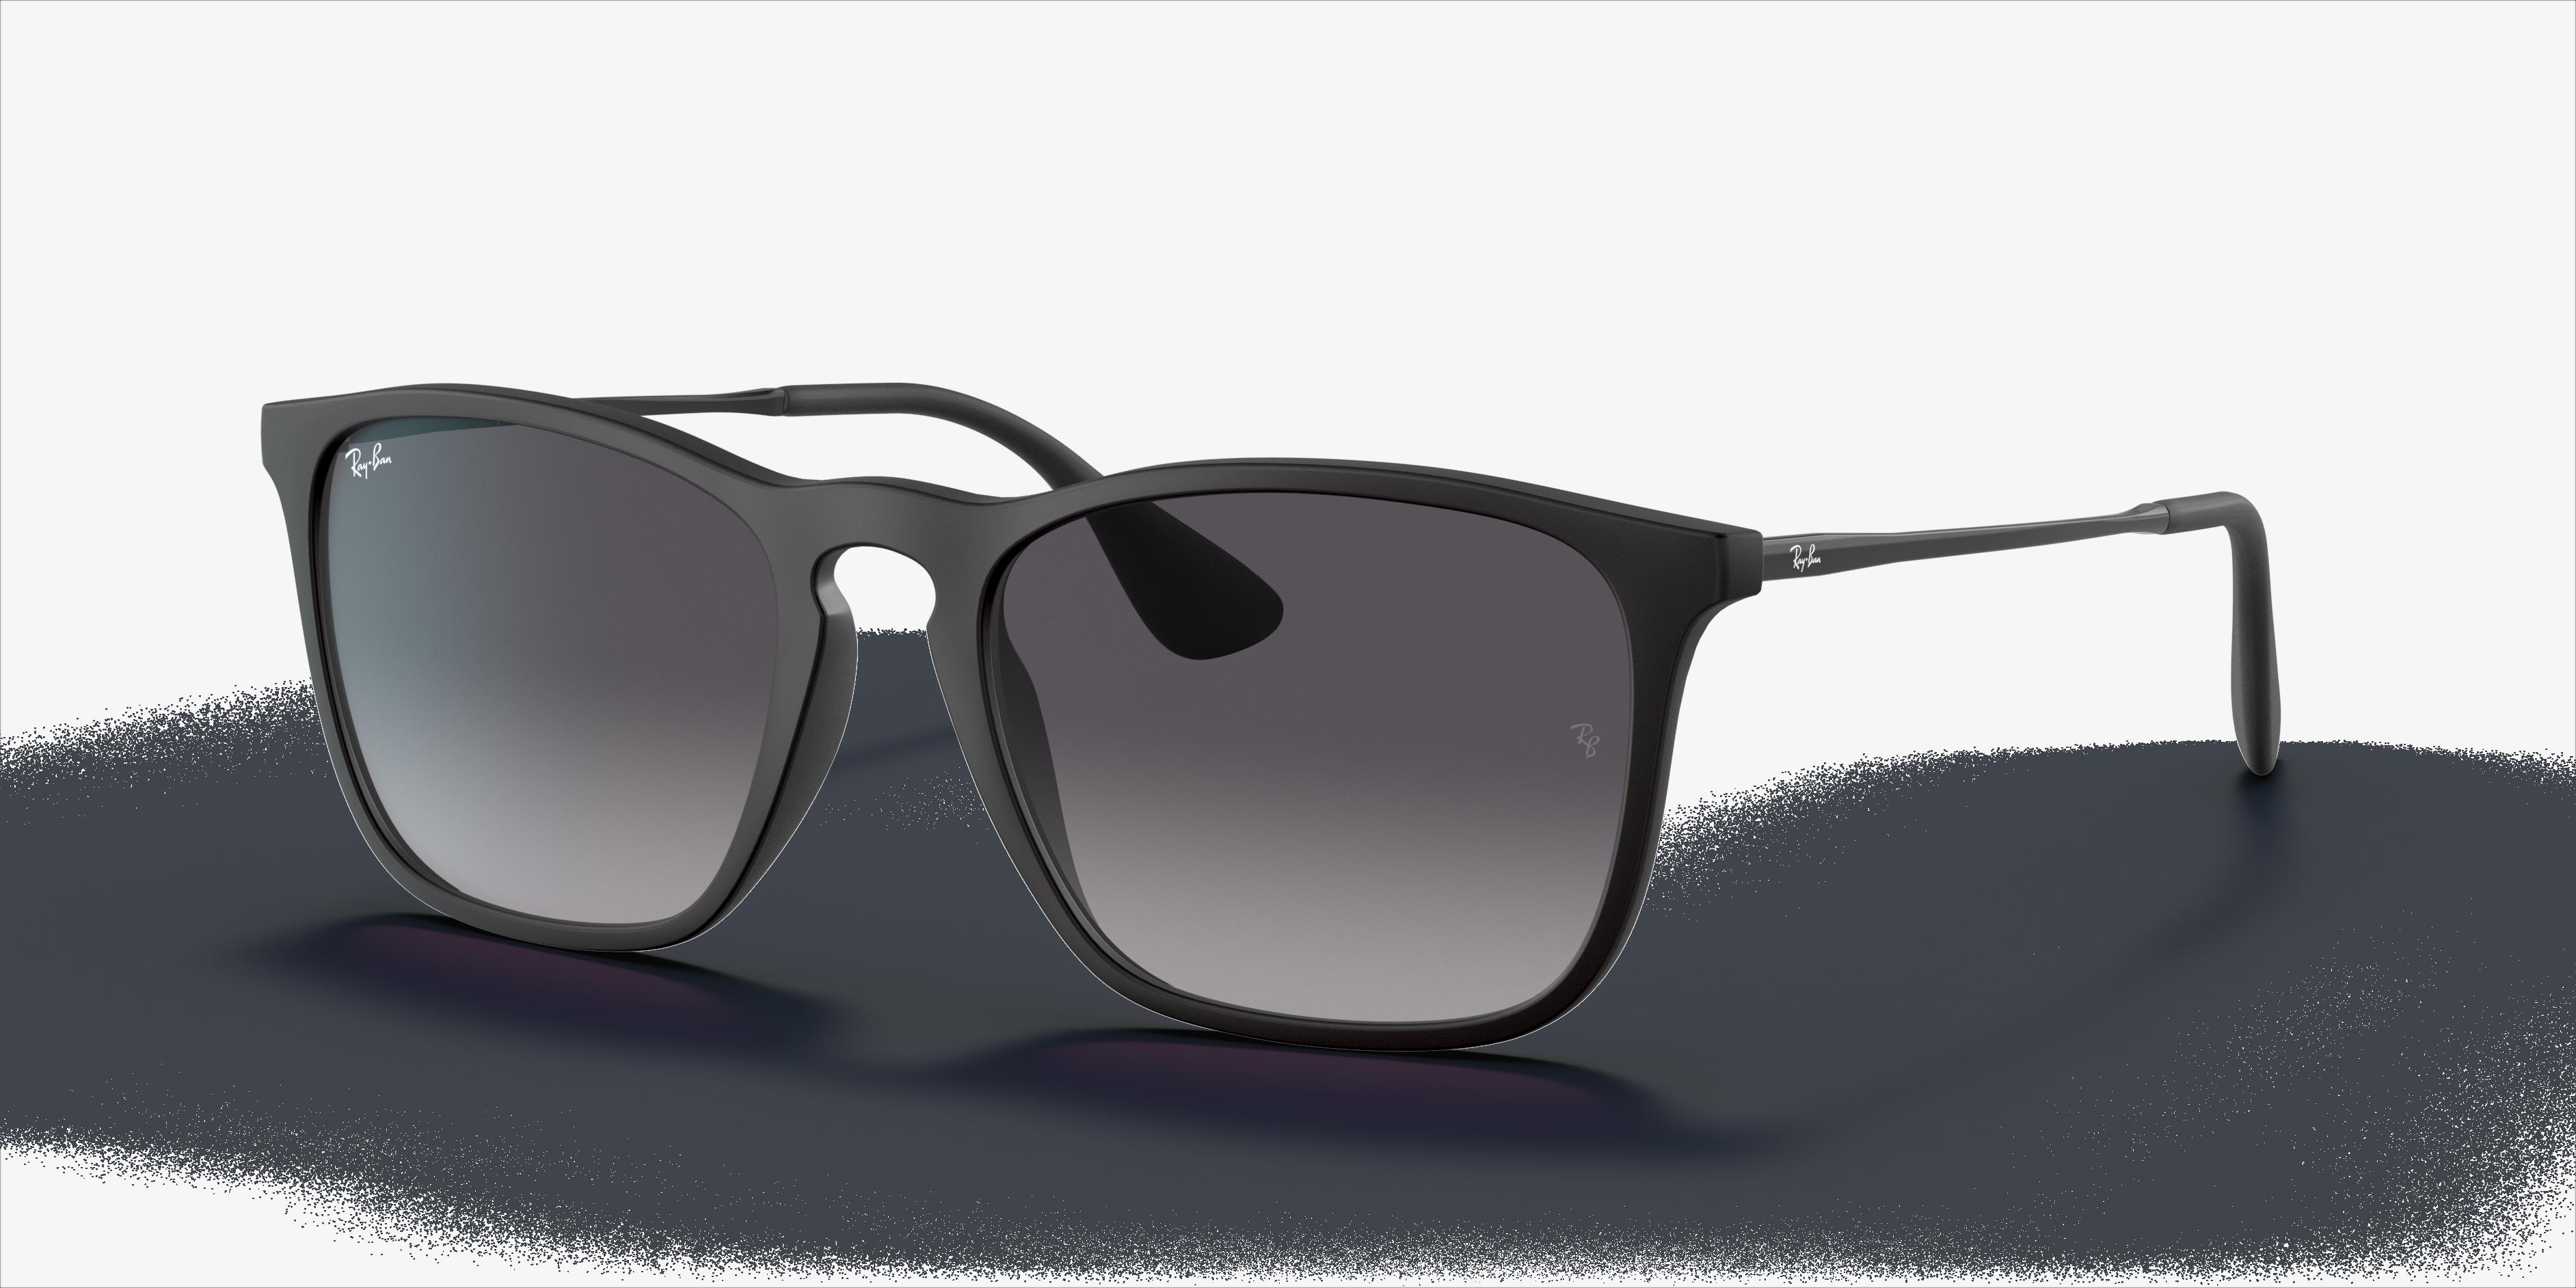 Ray-Ban Chris Low Bridge Fit Black, Gray Lenses - RB4187F